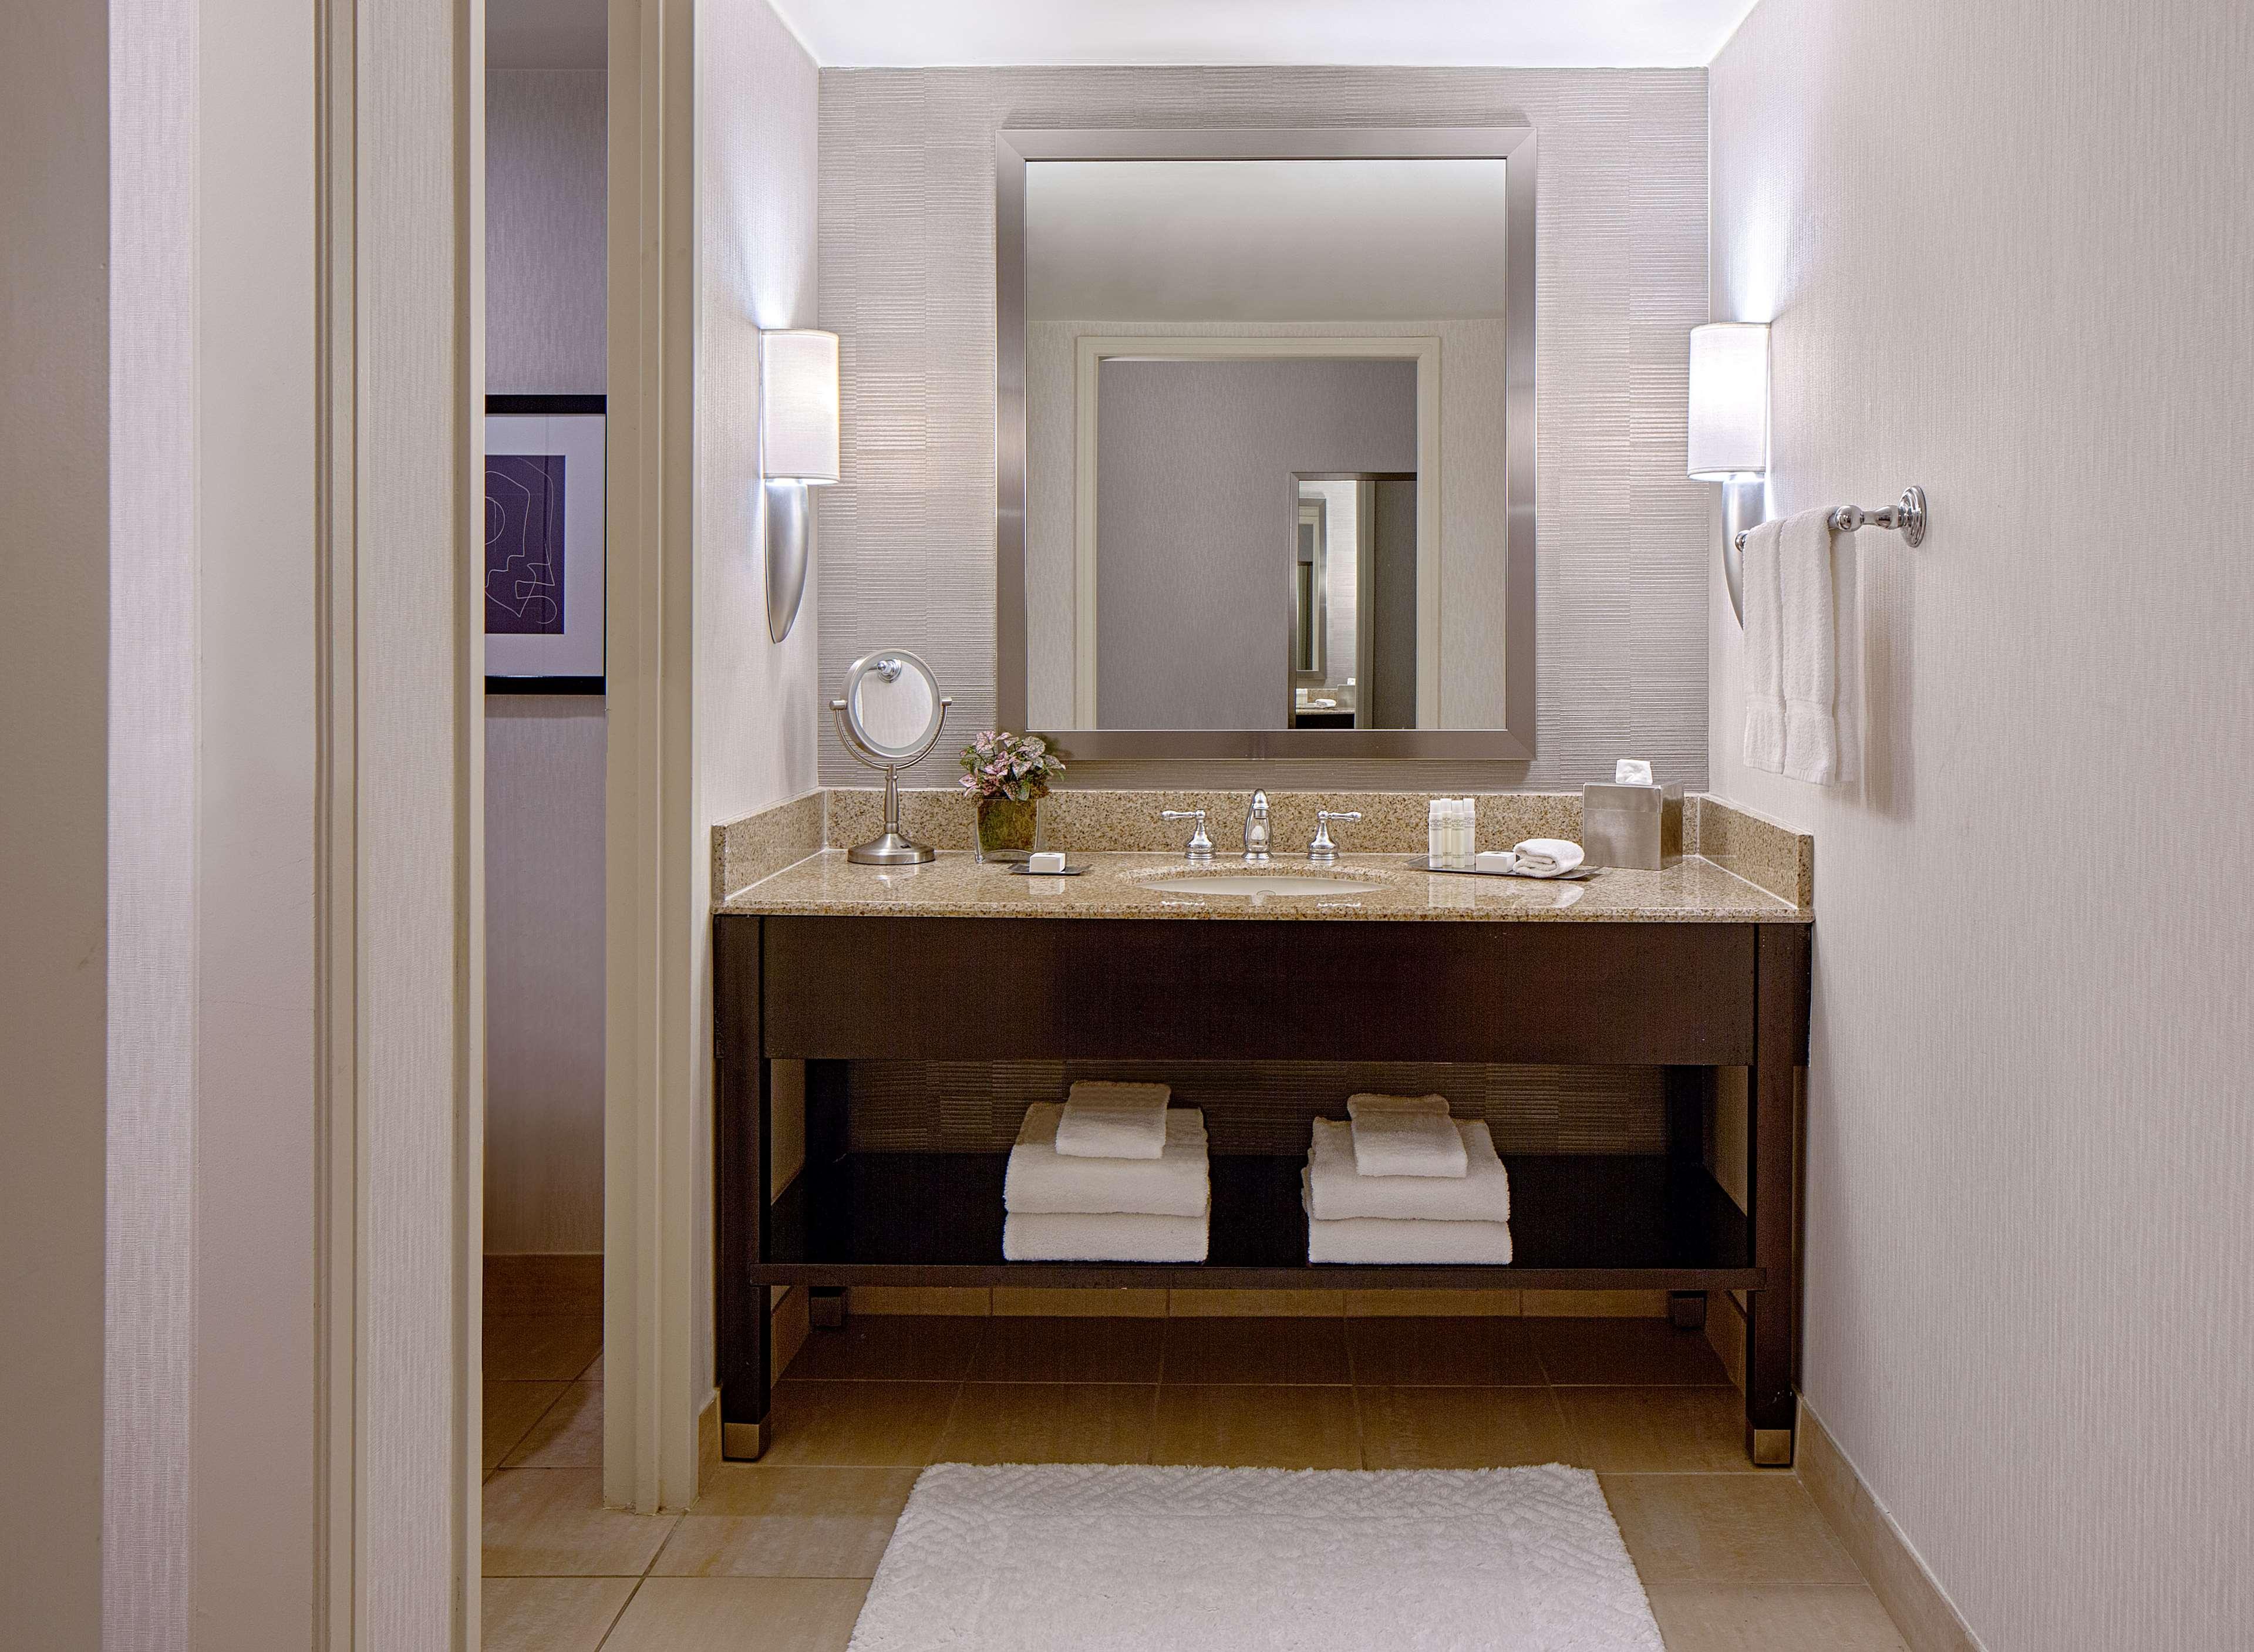 DoubleTree by Hilton Hotel Houston - Greenway Plaza image 29